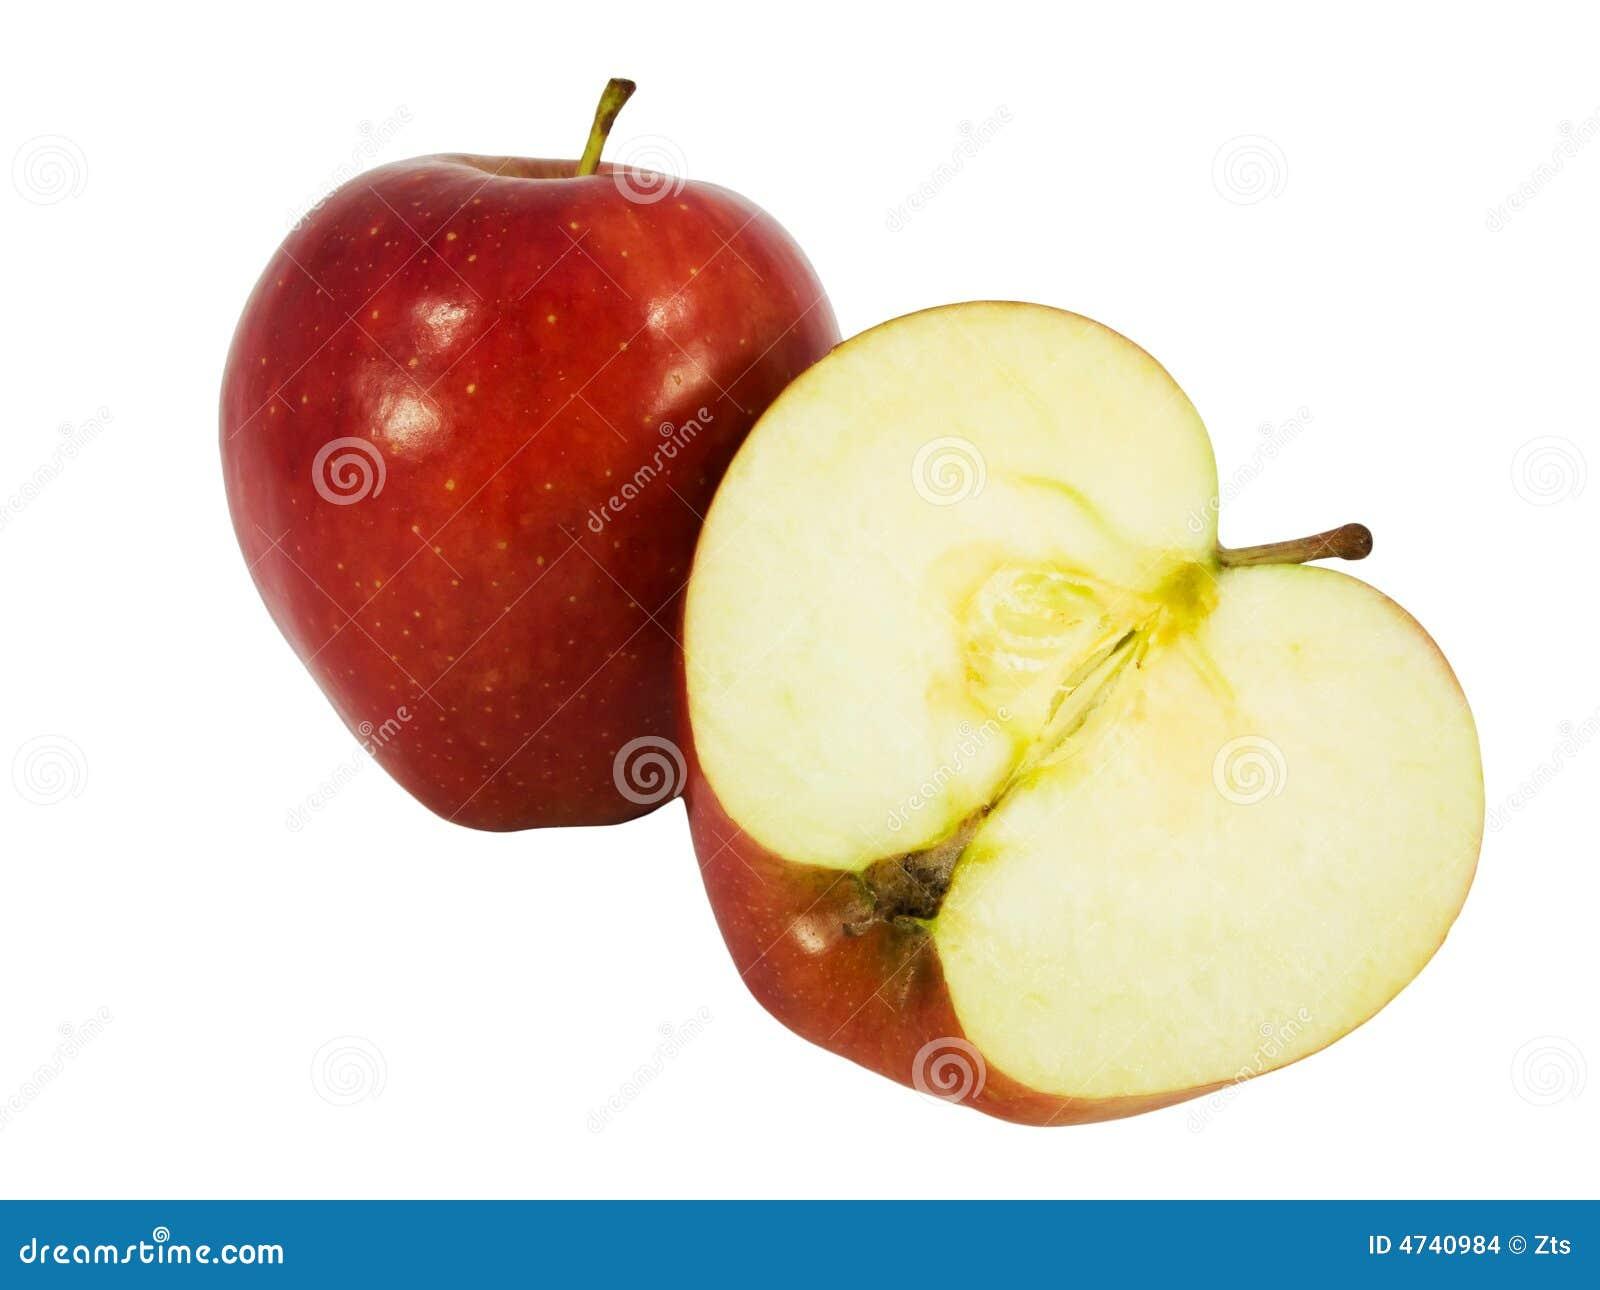 tasty red apple cut in half stock photo image 4740984